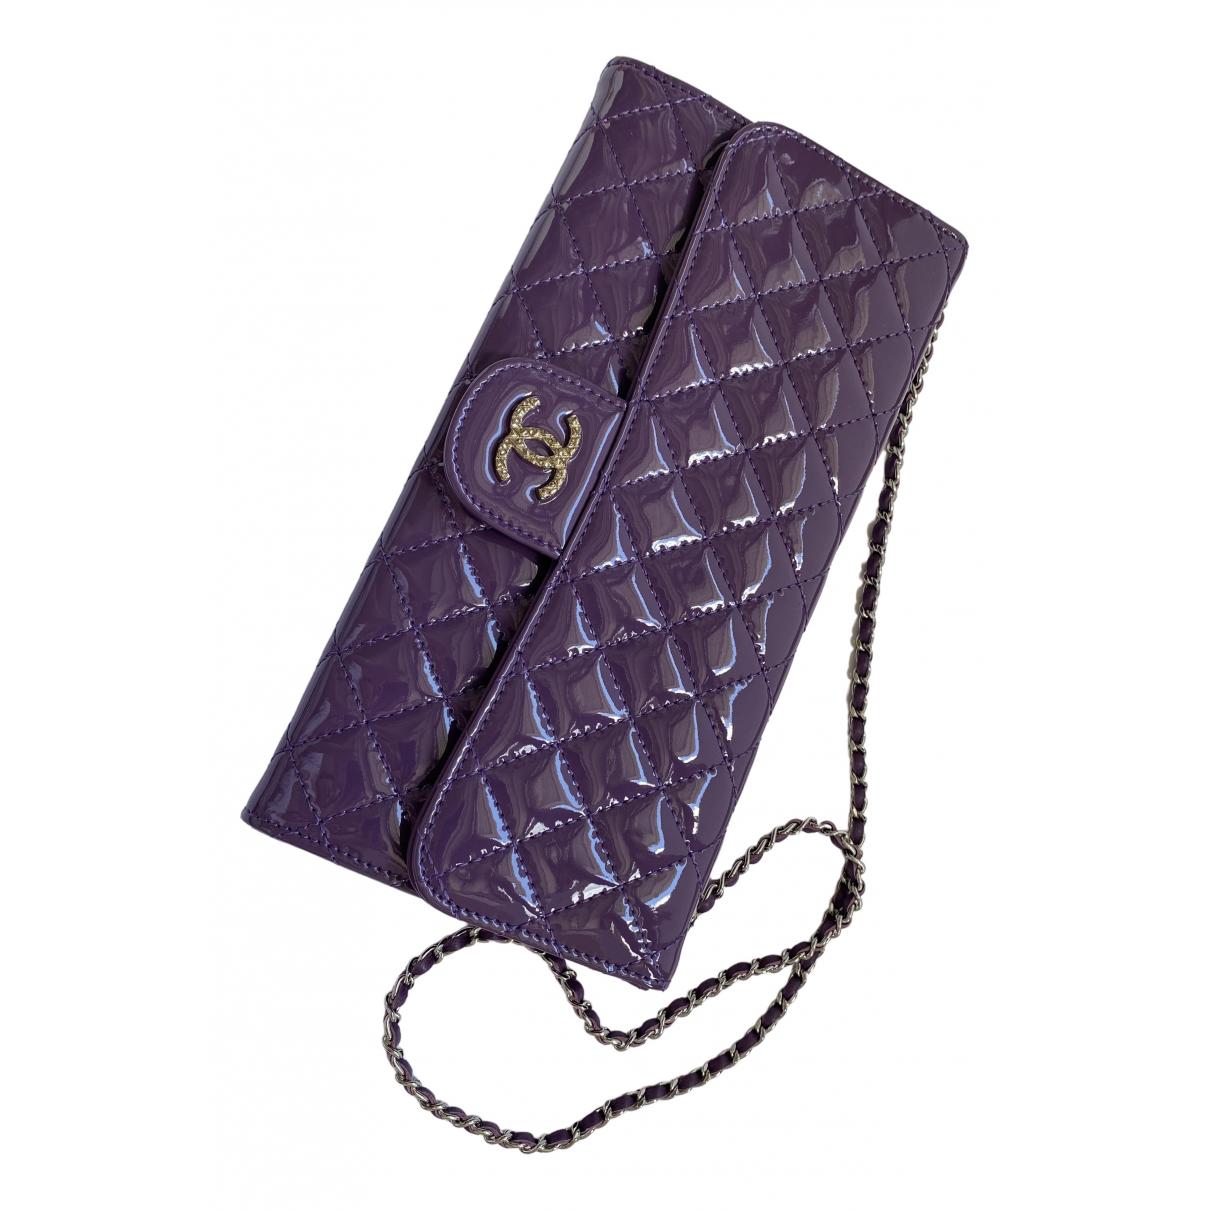 Chanel Timeless/Classique Handtasche in  Lila Lackleder